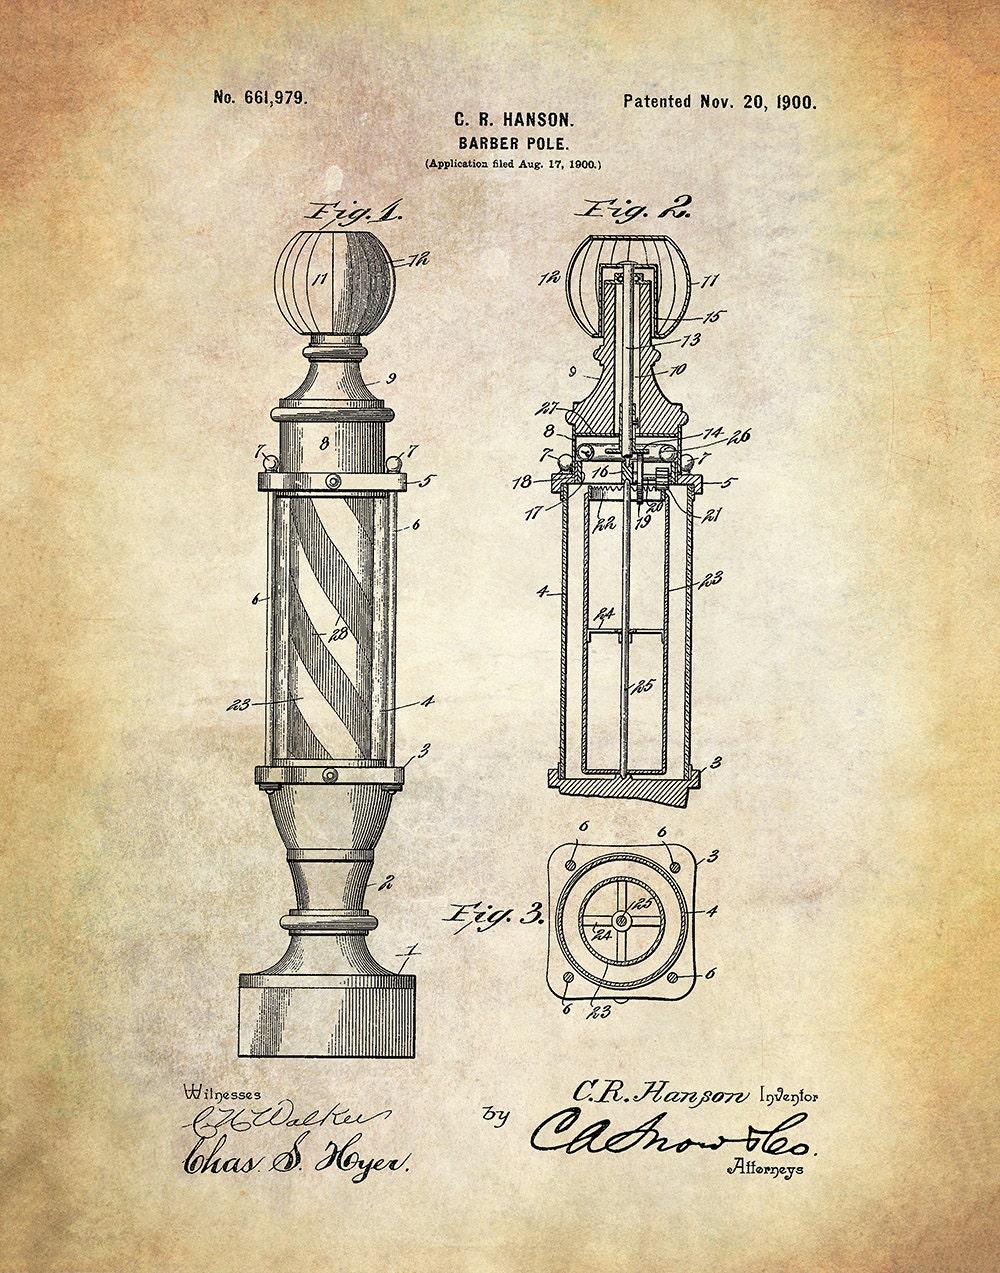 Preferred Barber Pole Patent Art Print - Vintage Barber's Shop Advertising  XQ51